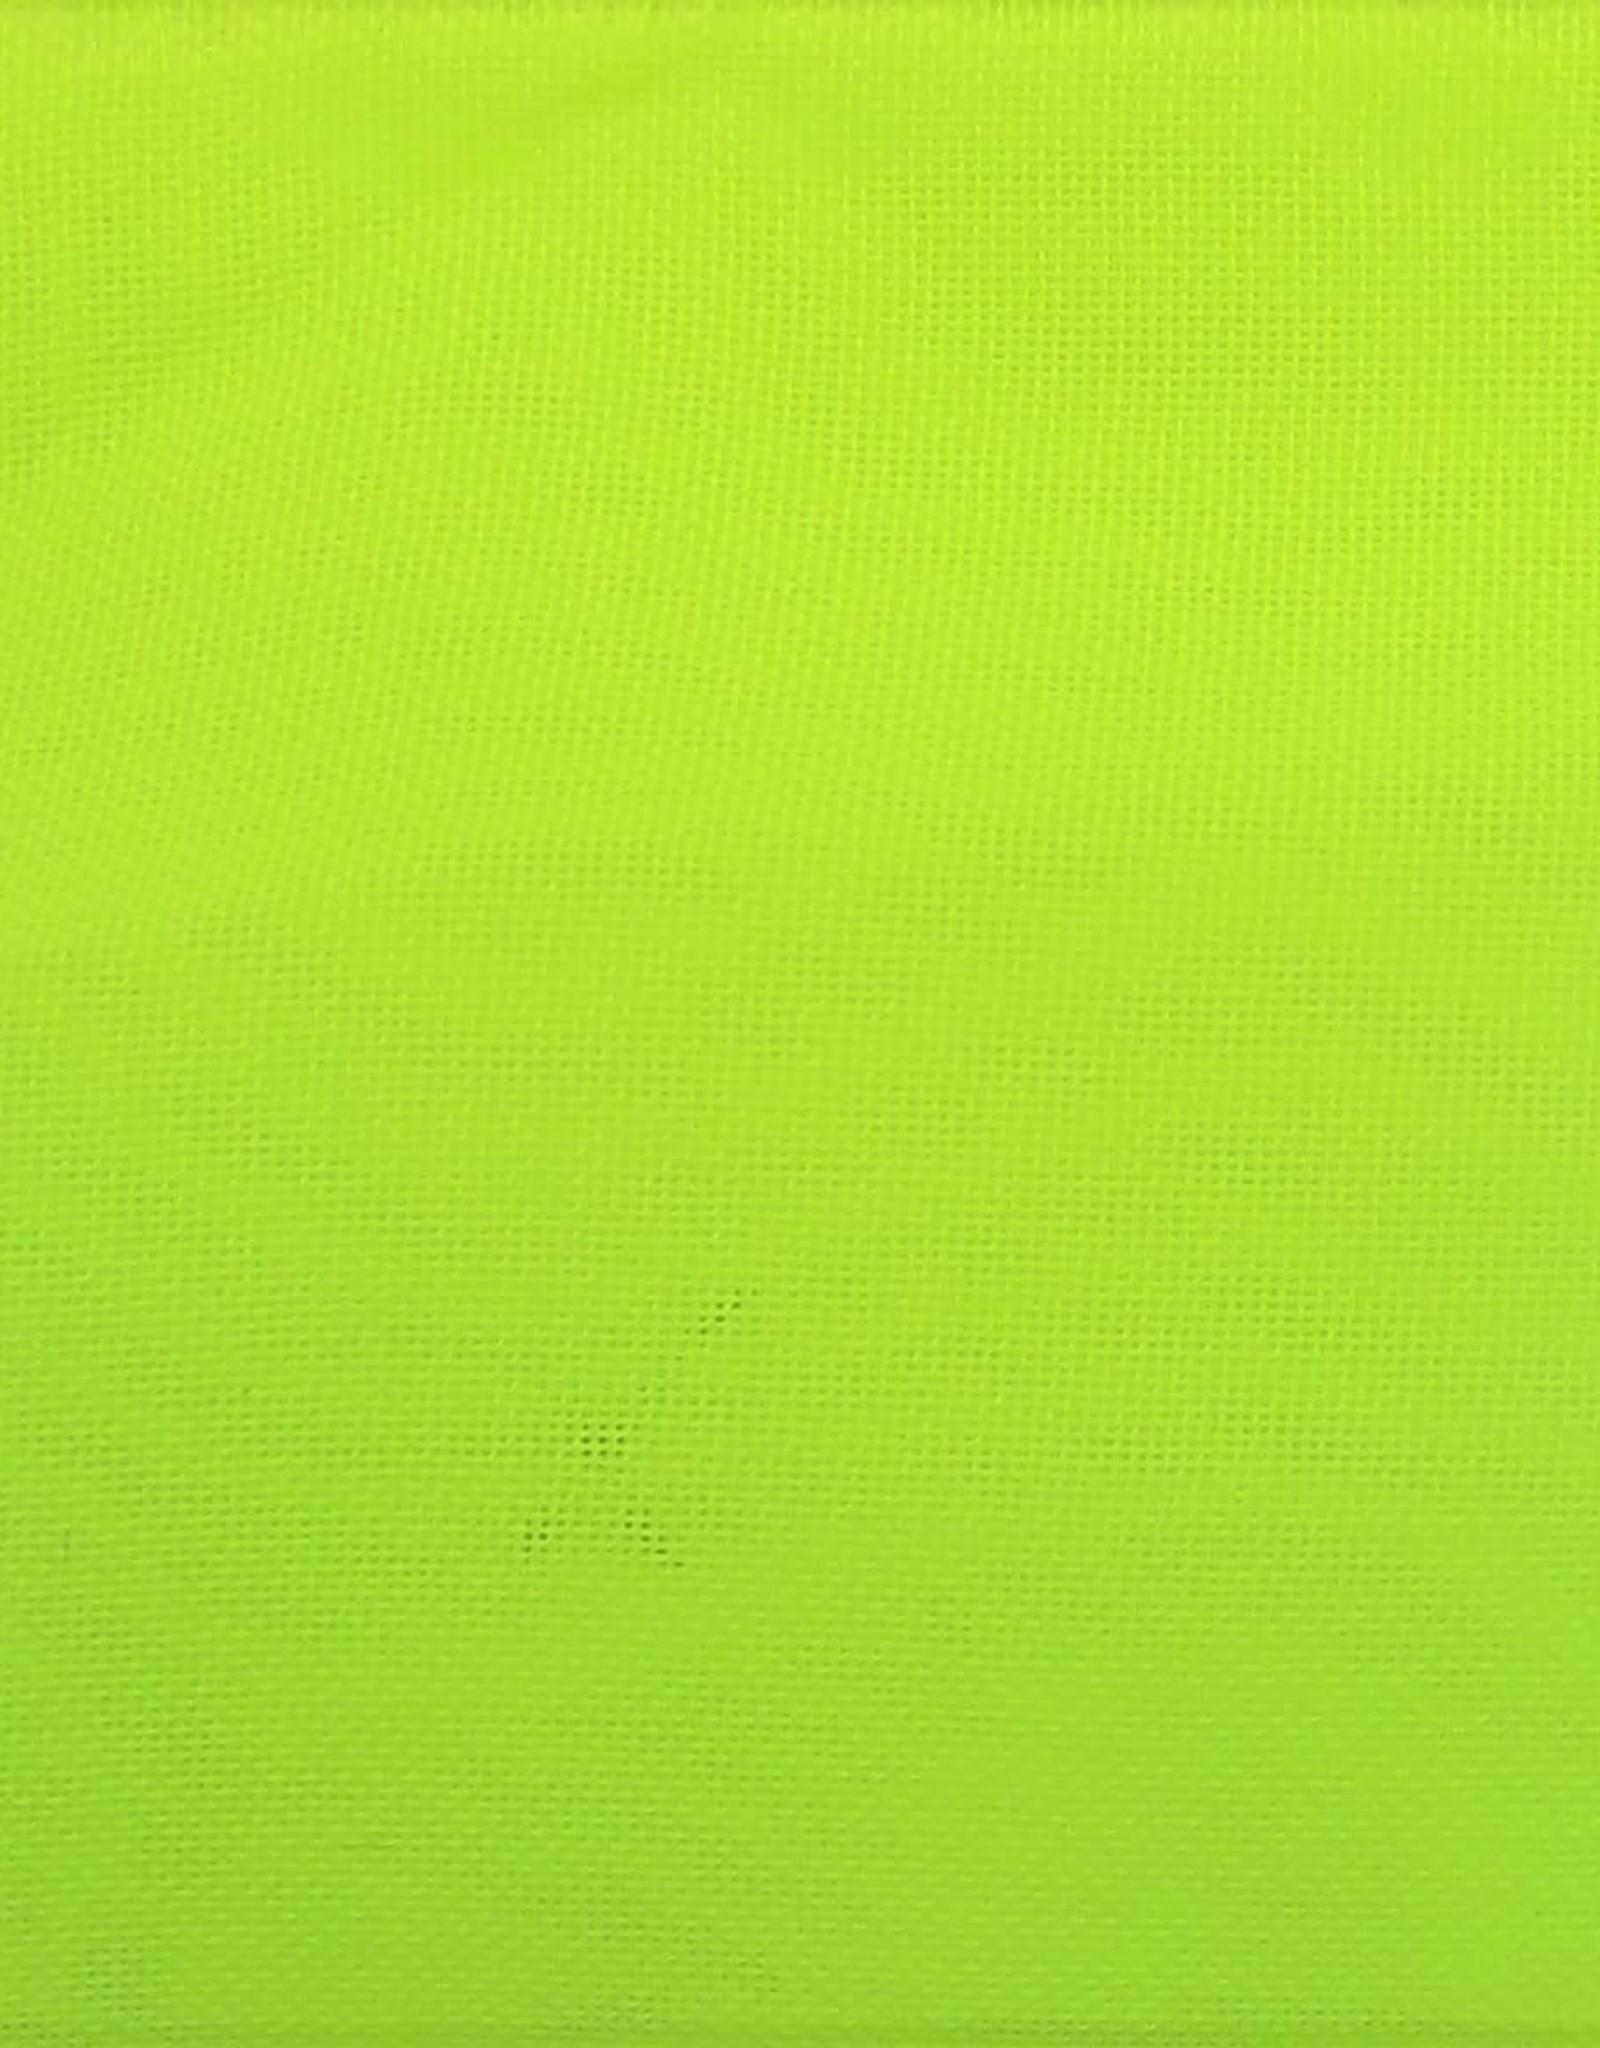 Chiffon 58 - 60 Inches Neon Yellow (Yard)